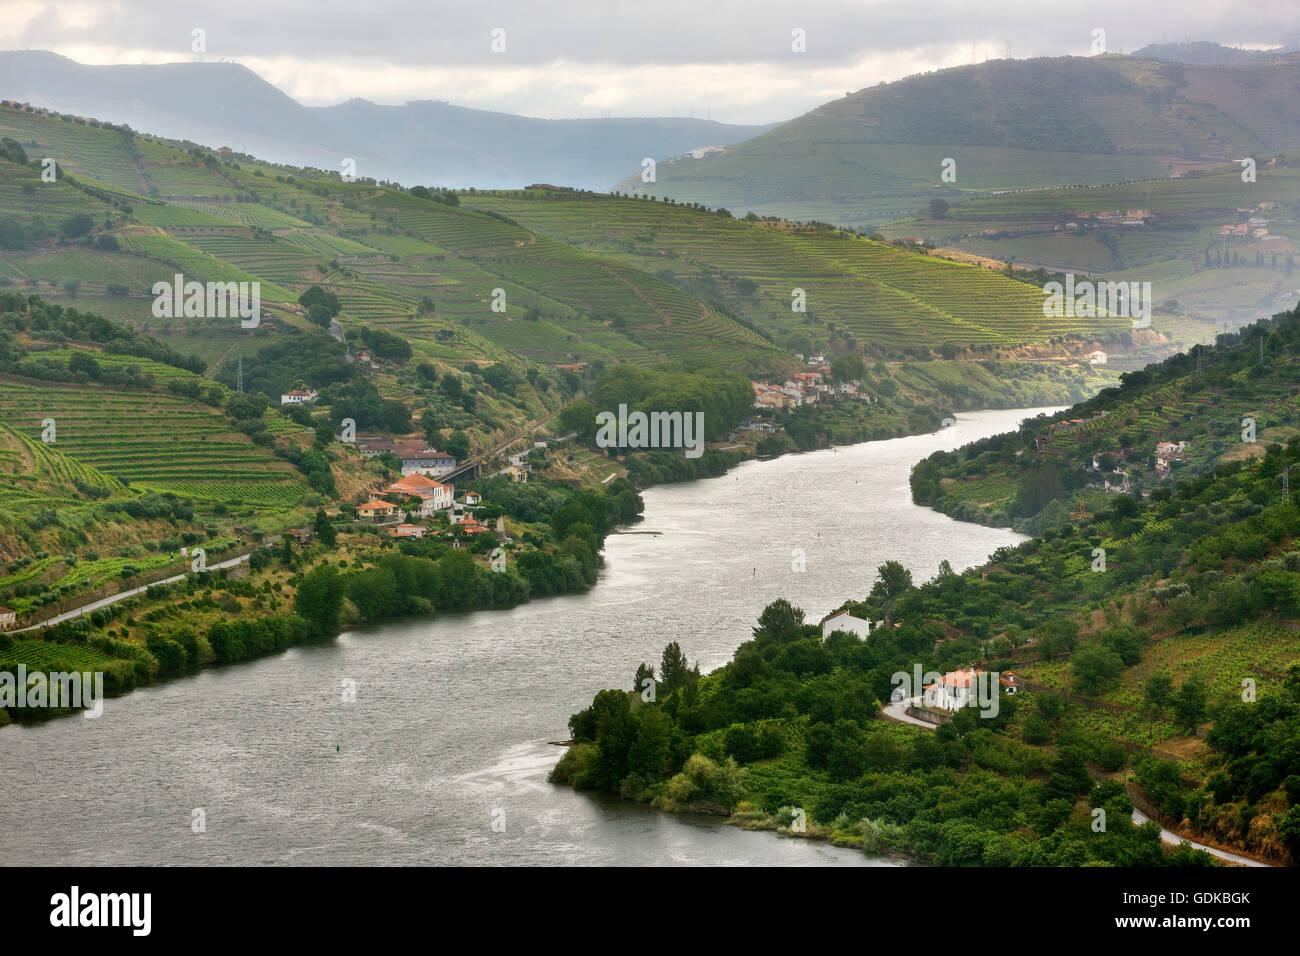 Wine area medium Douro River, Douro Valley, Vineyard, Panorama, Santa Cristina, District of Vila Real, Portugal, - Stock Image